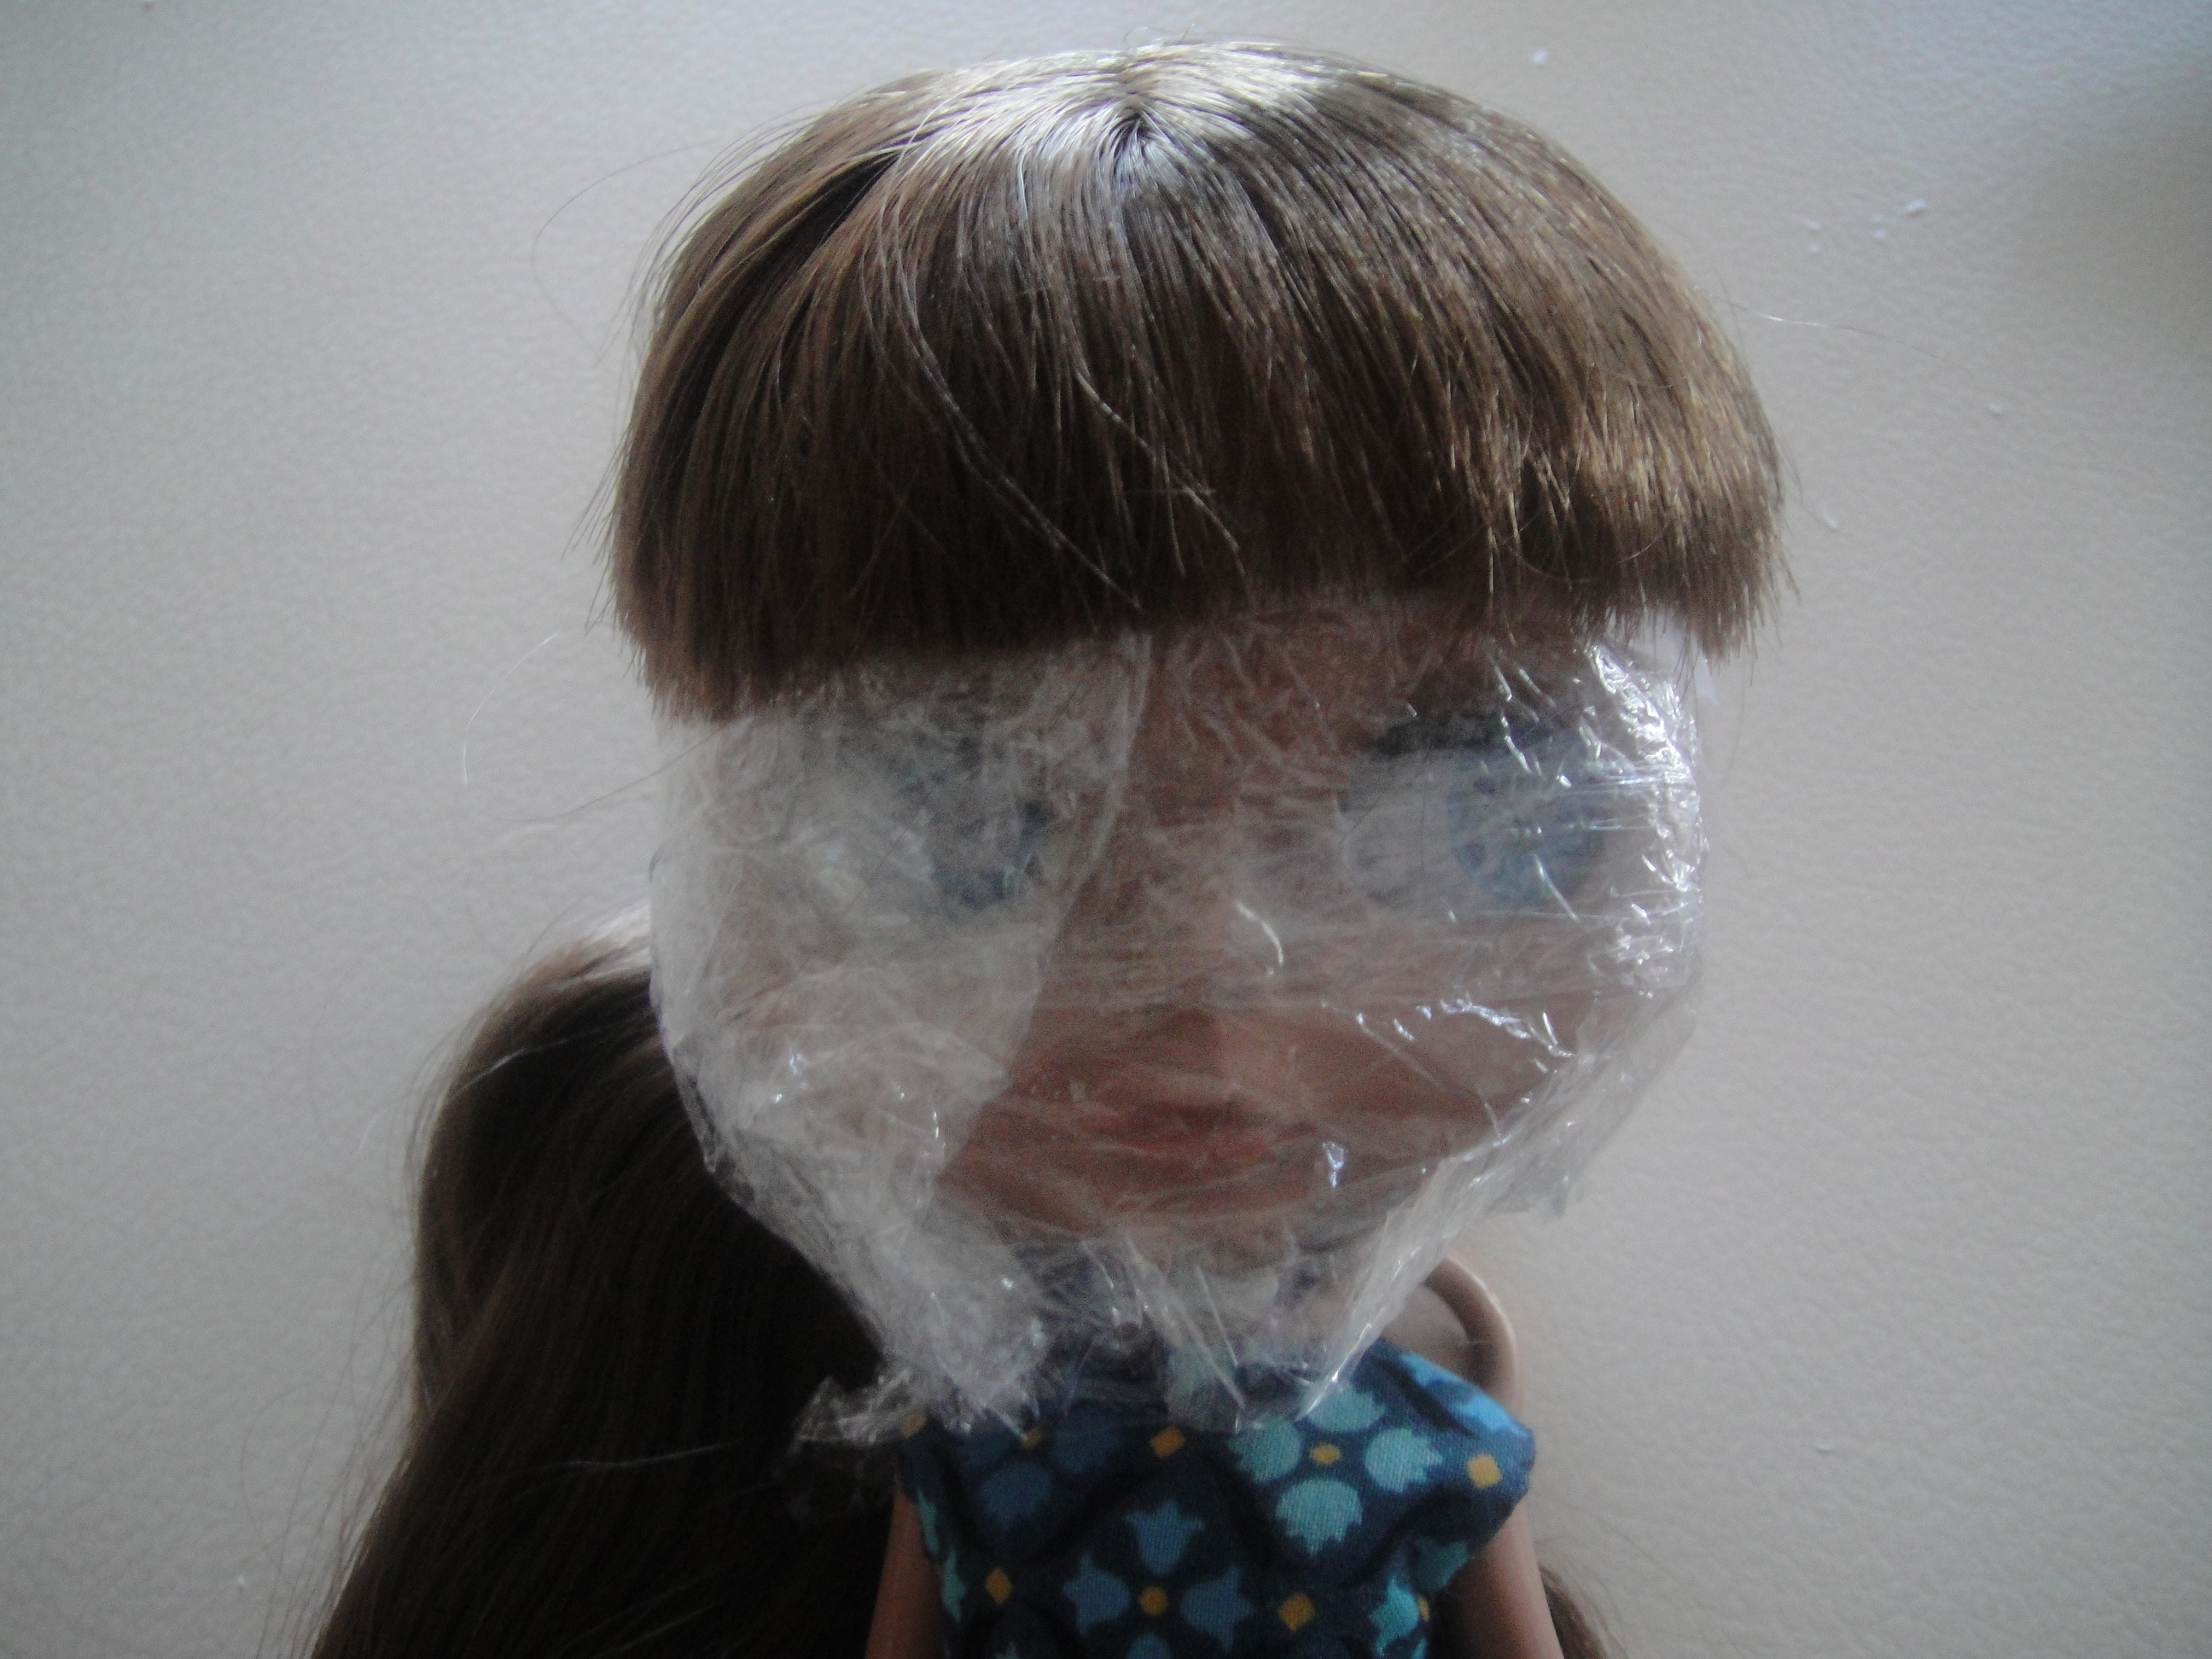 Asha's covered face